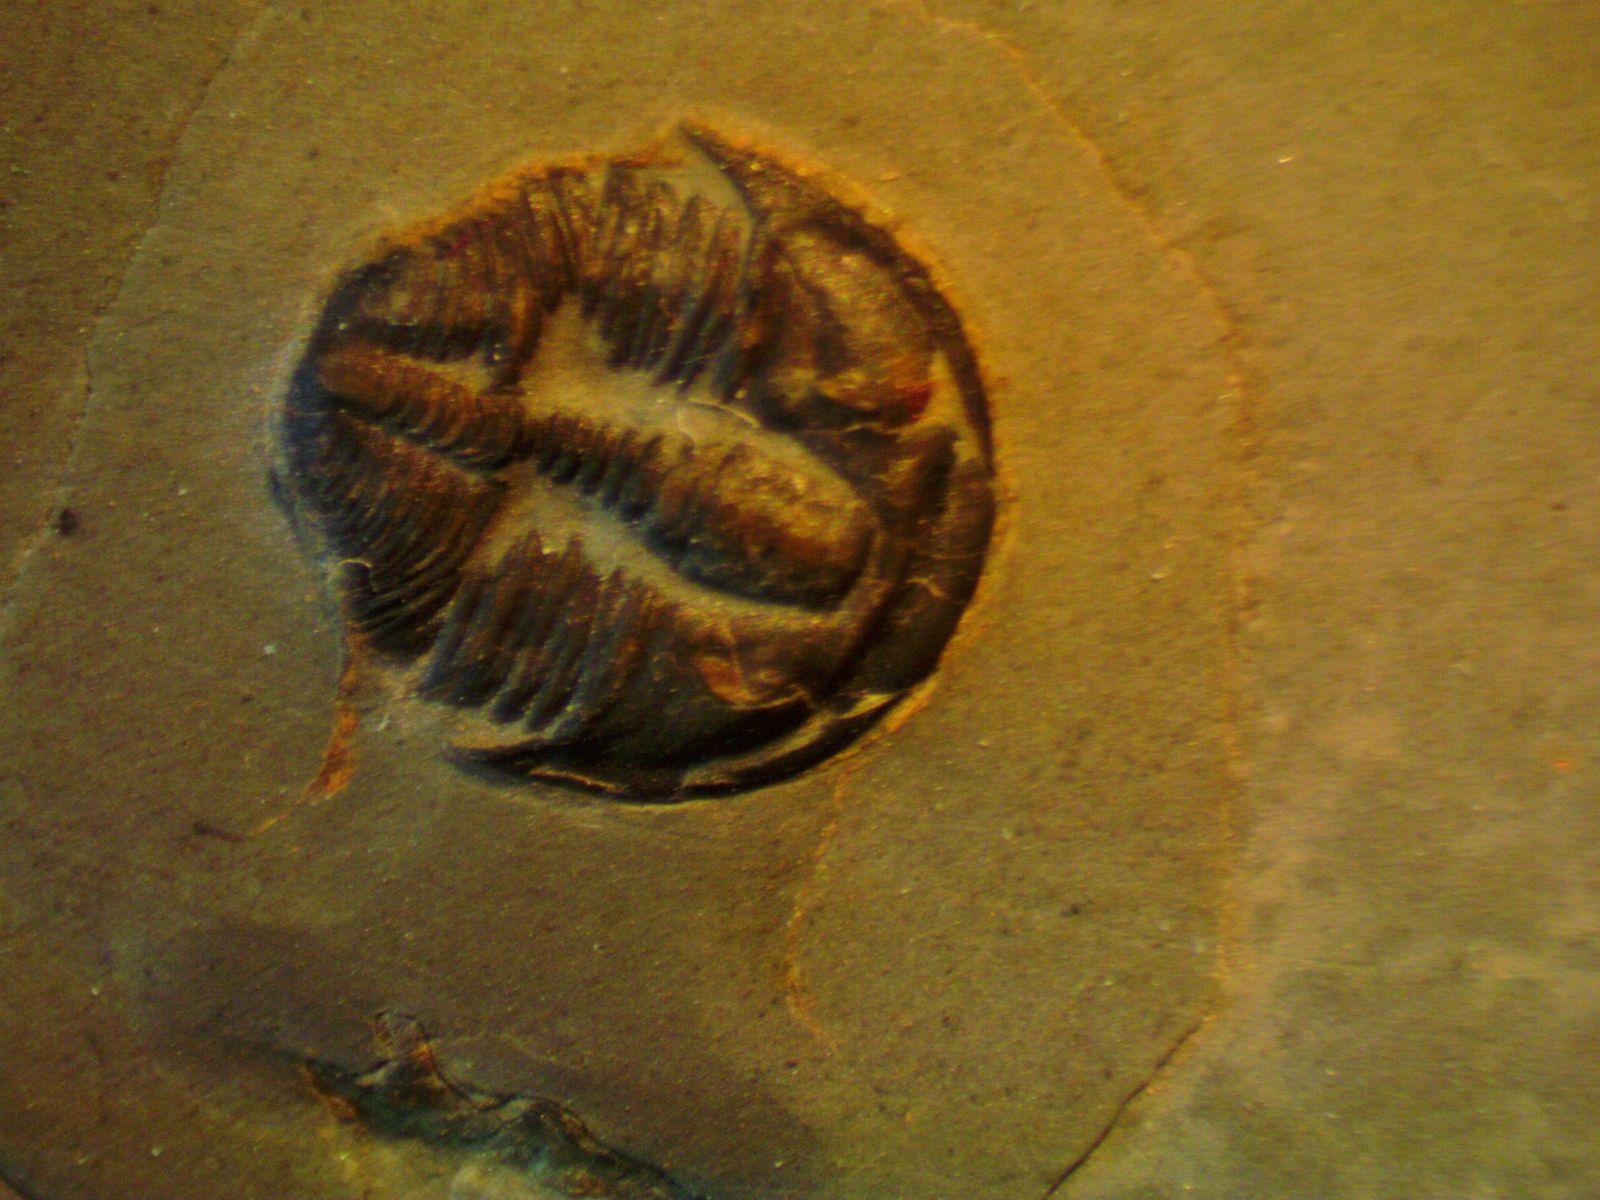 Bolaspidella housensis (1c)